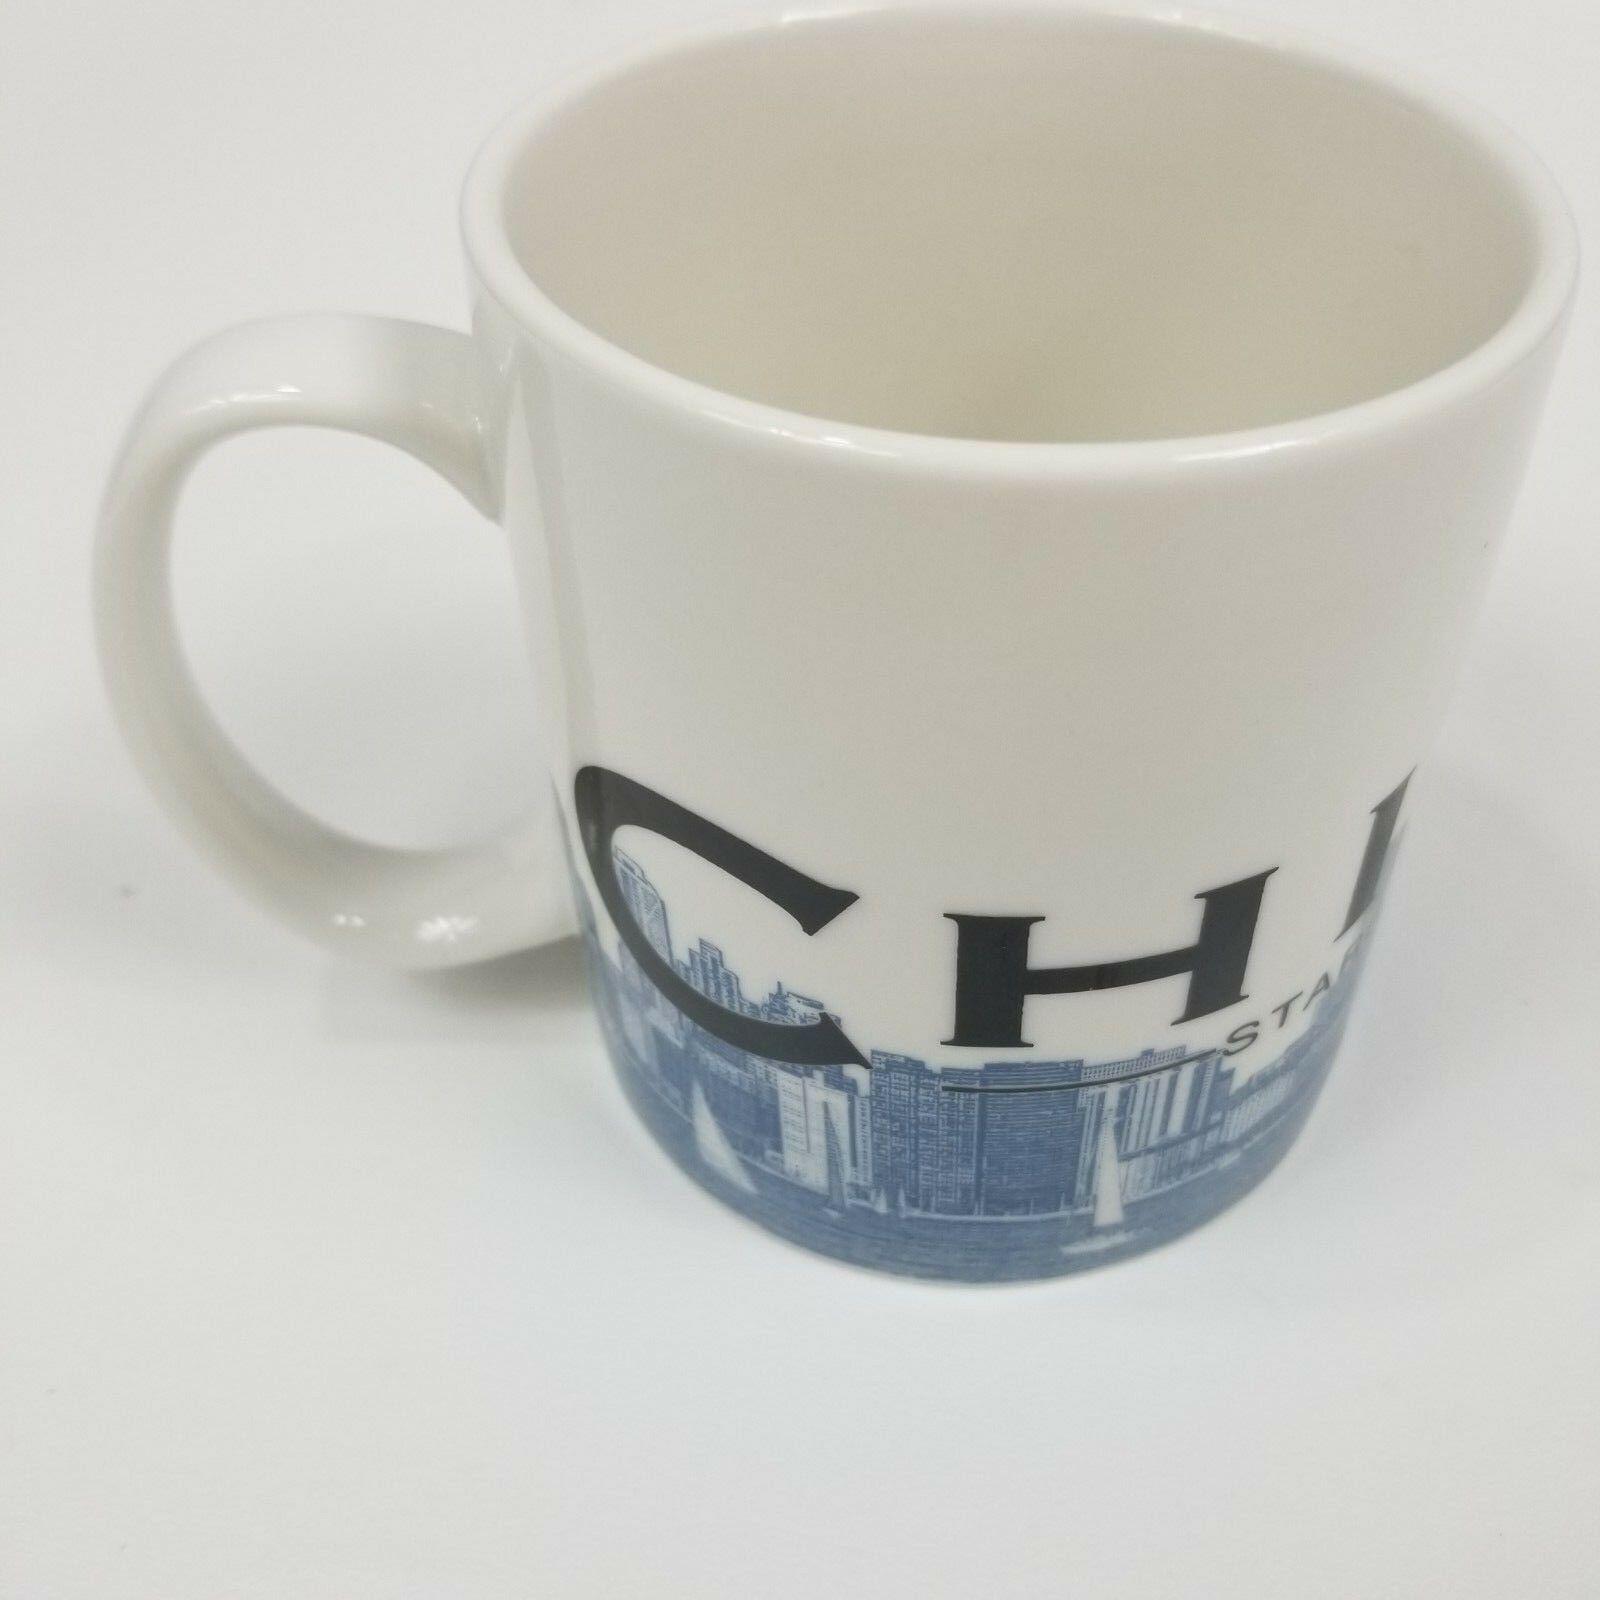 Starbucks Chicago Skyline Series Mug Coffee Cup Tea Large Windy City Barista image 2